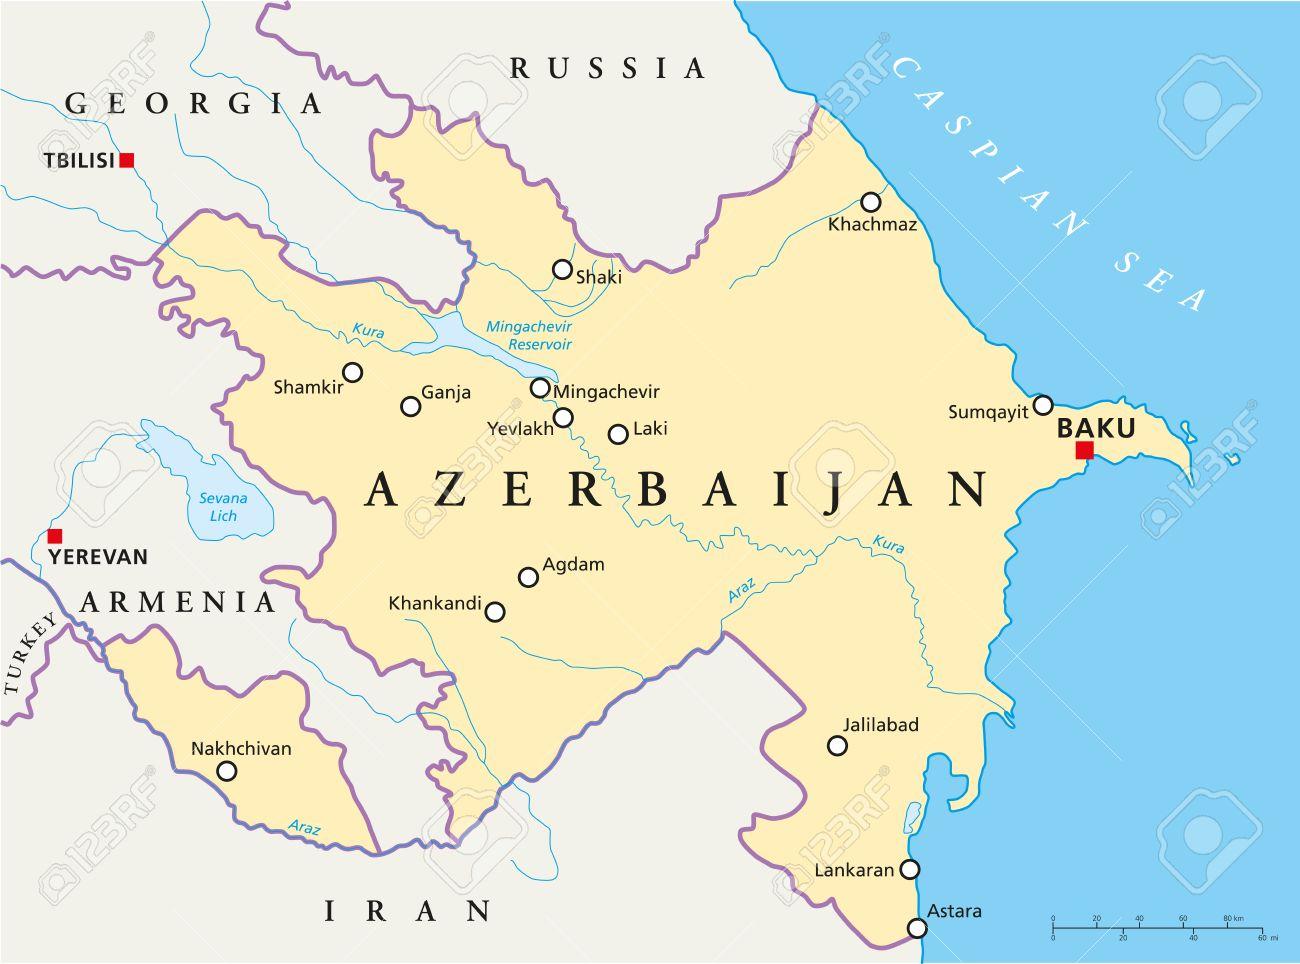 Baku Azerbaijan Map Azerbaijan Political Map With Capital Baku, National Borders